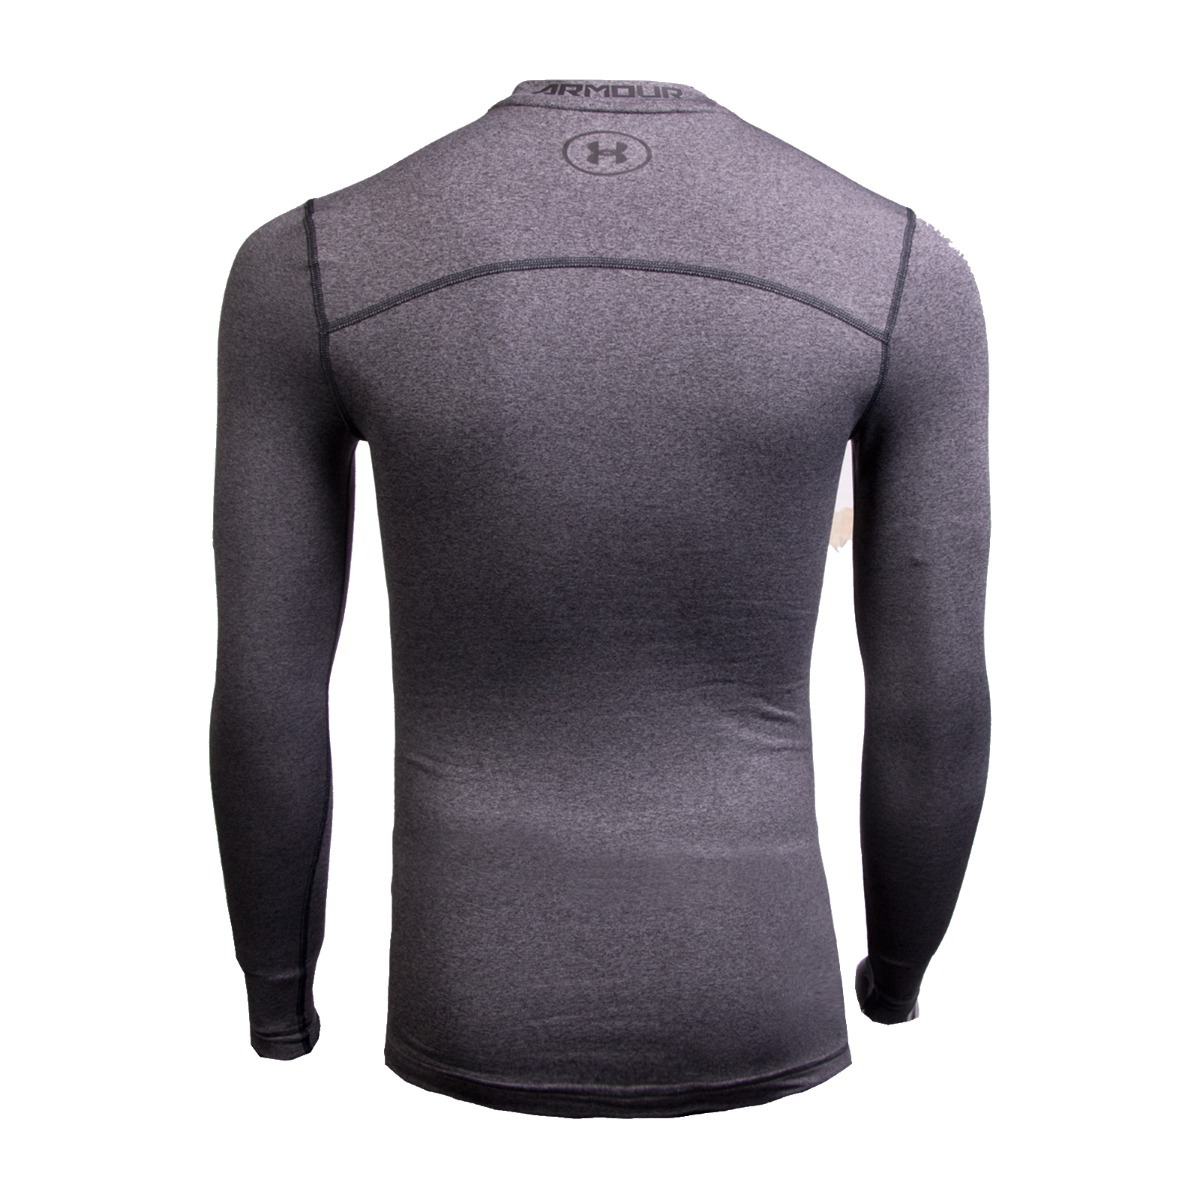 ec32cf66fd154 Camiseta Térmica Under Armour De Compresión Coldgear -   1.649